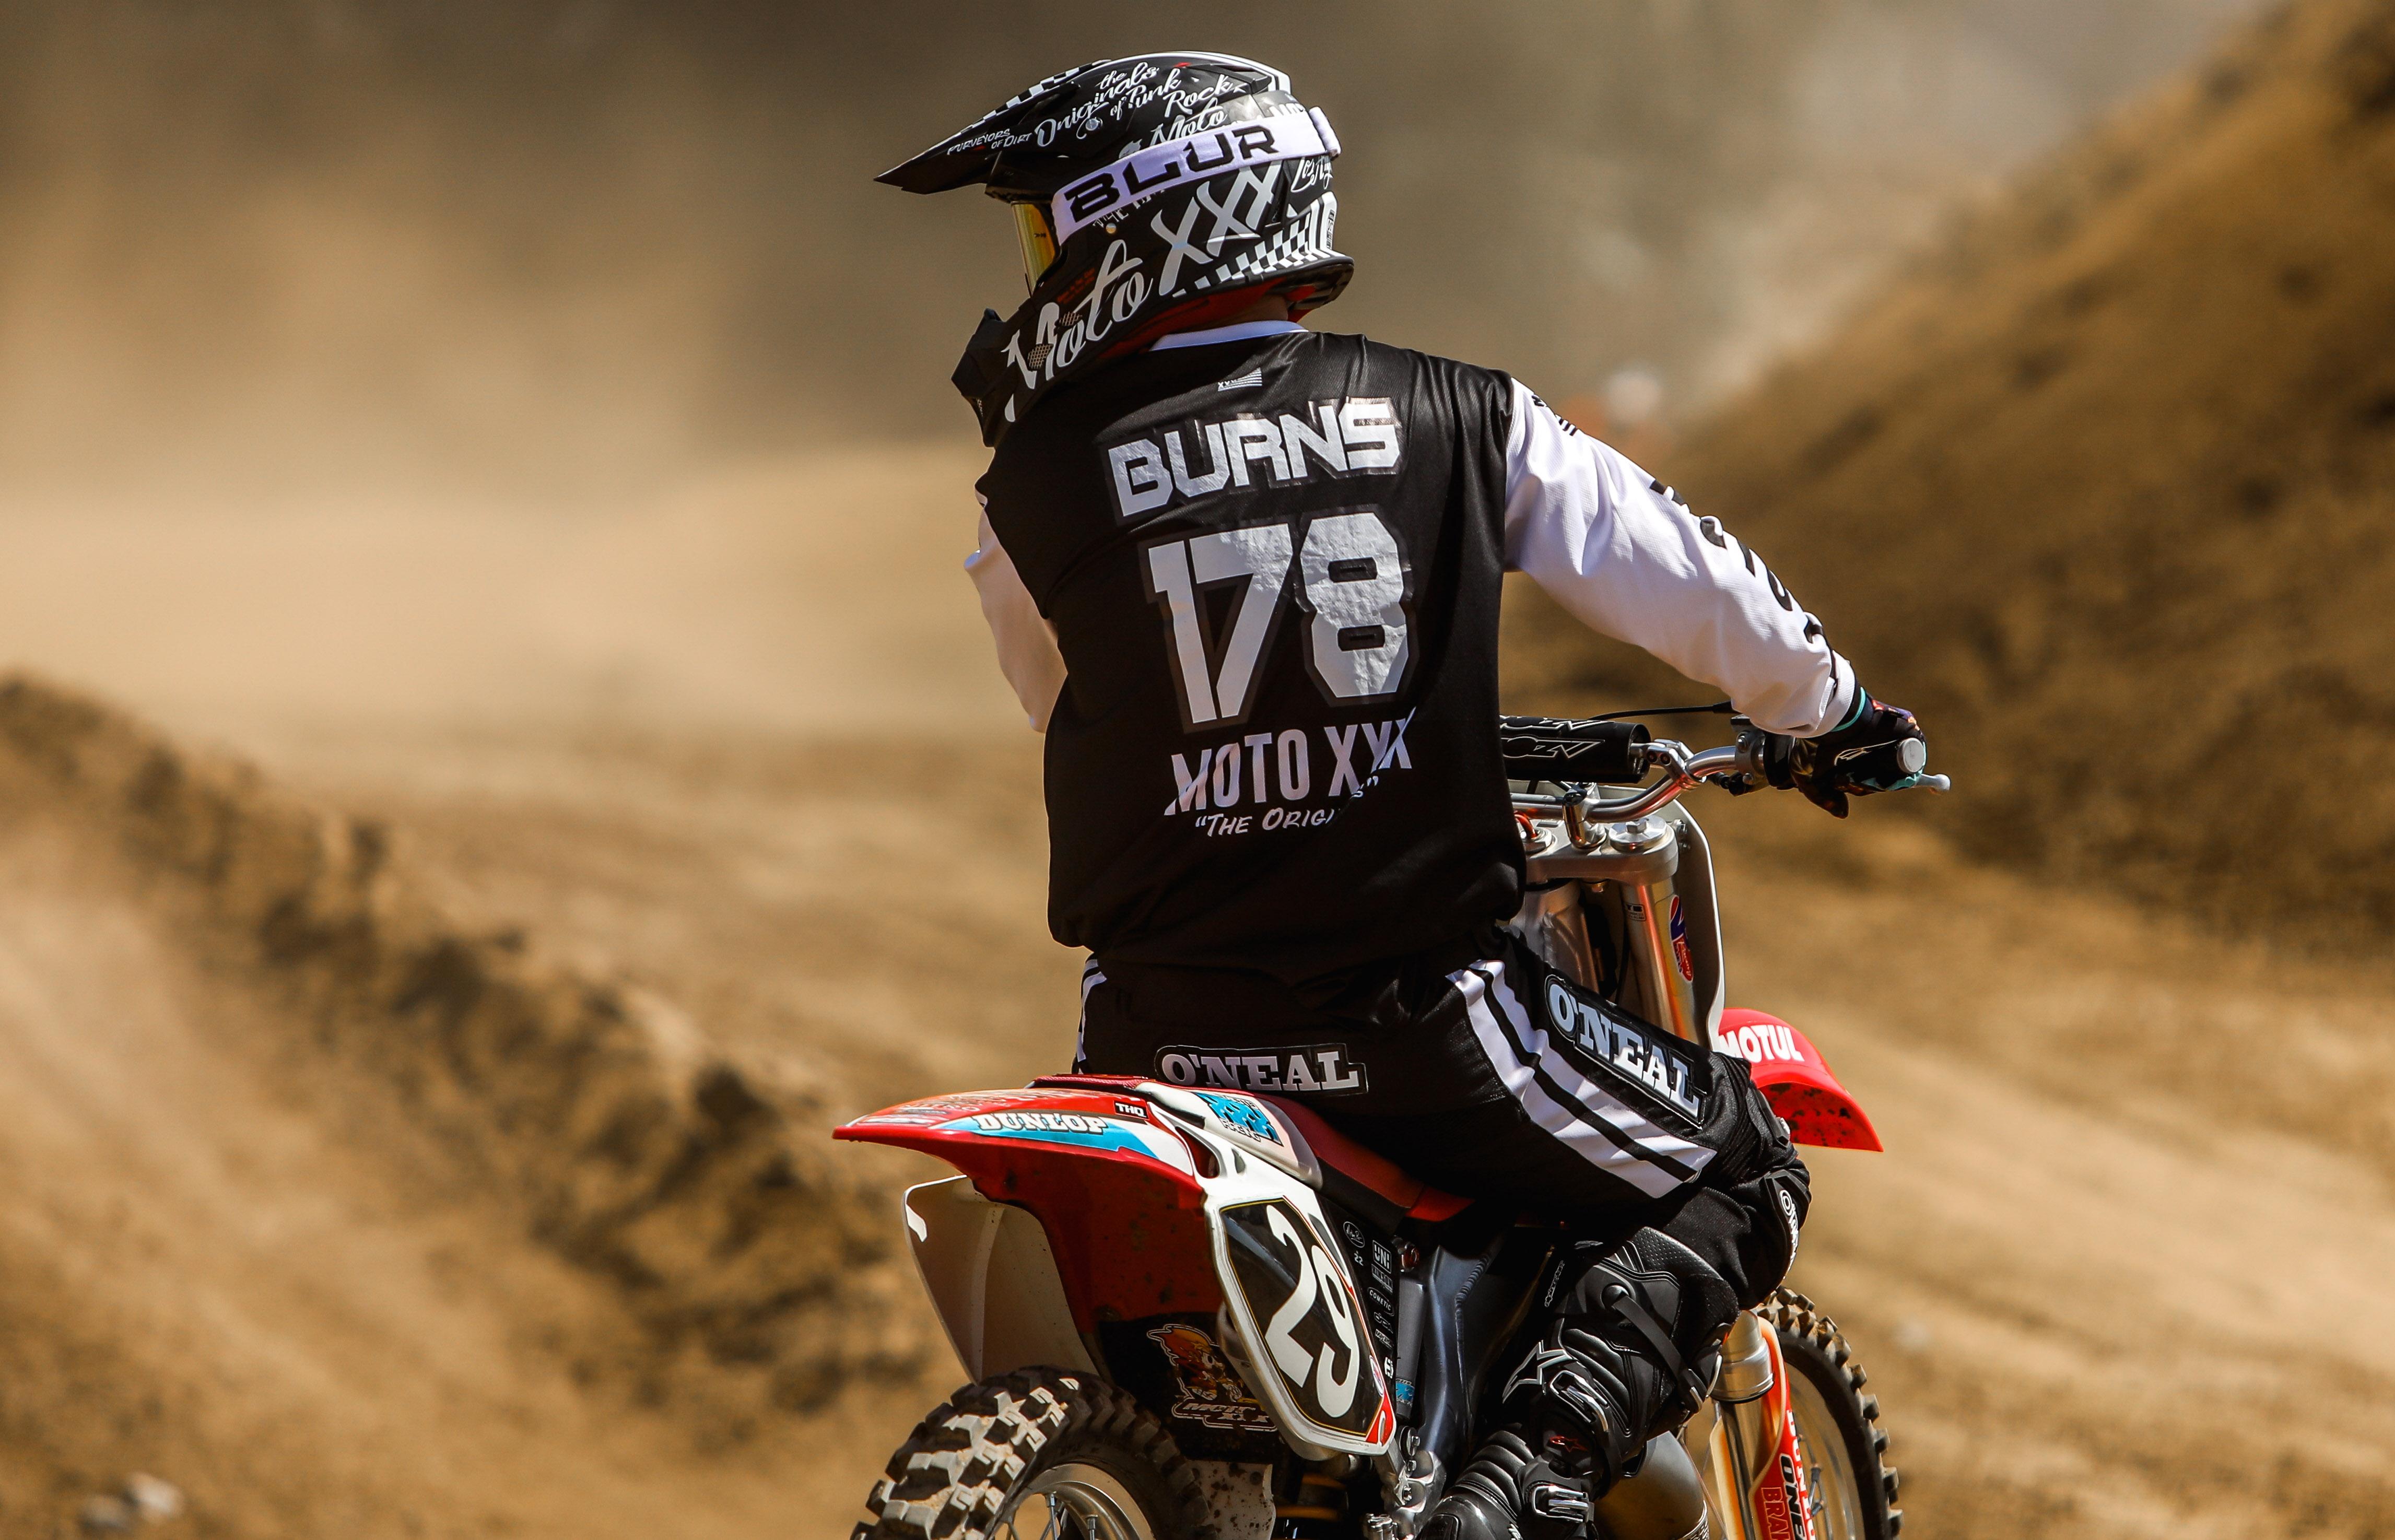 History in Supercross: Interview with Jordan Burns of Moto XXX, Part 1